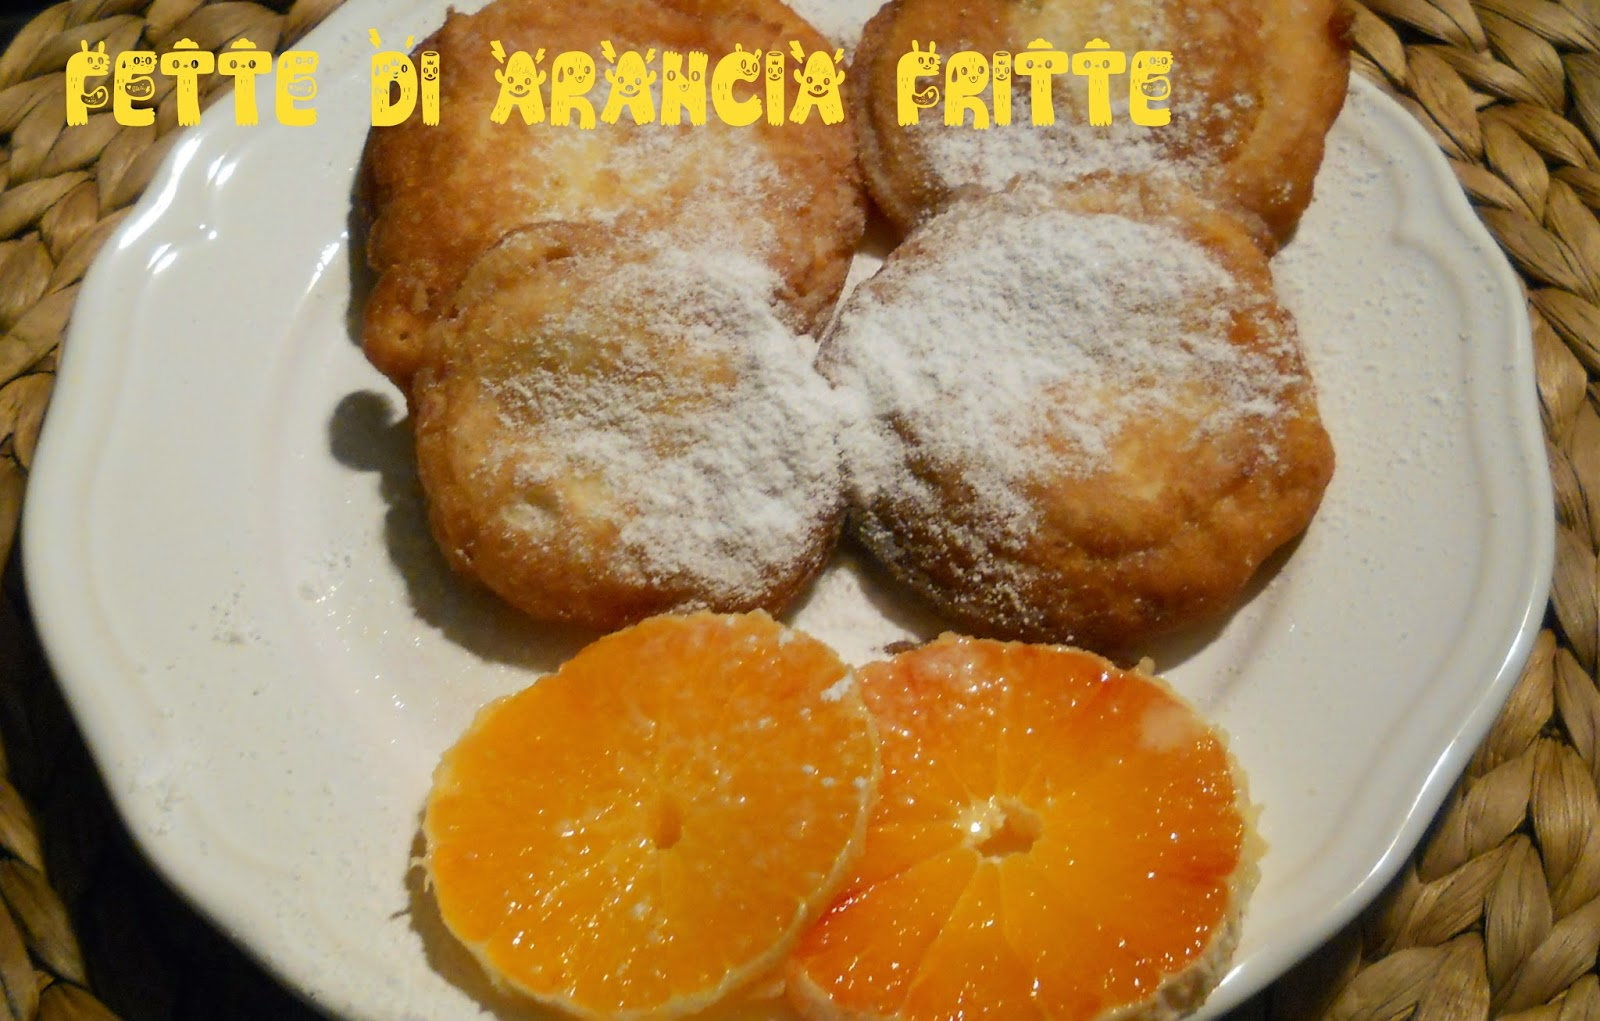 arance in pastella per l'airc